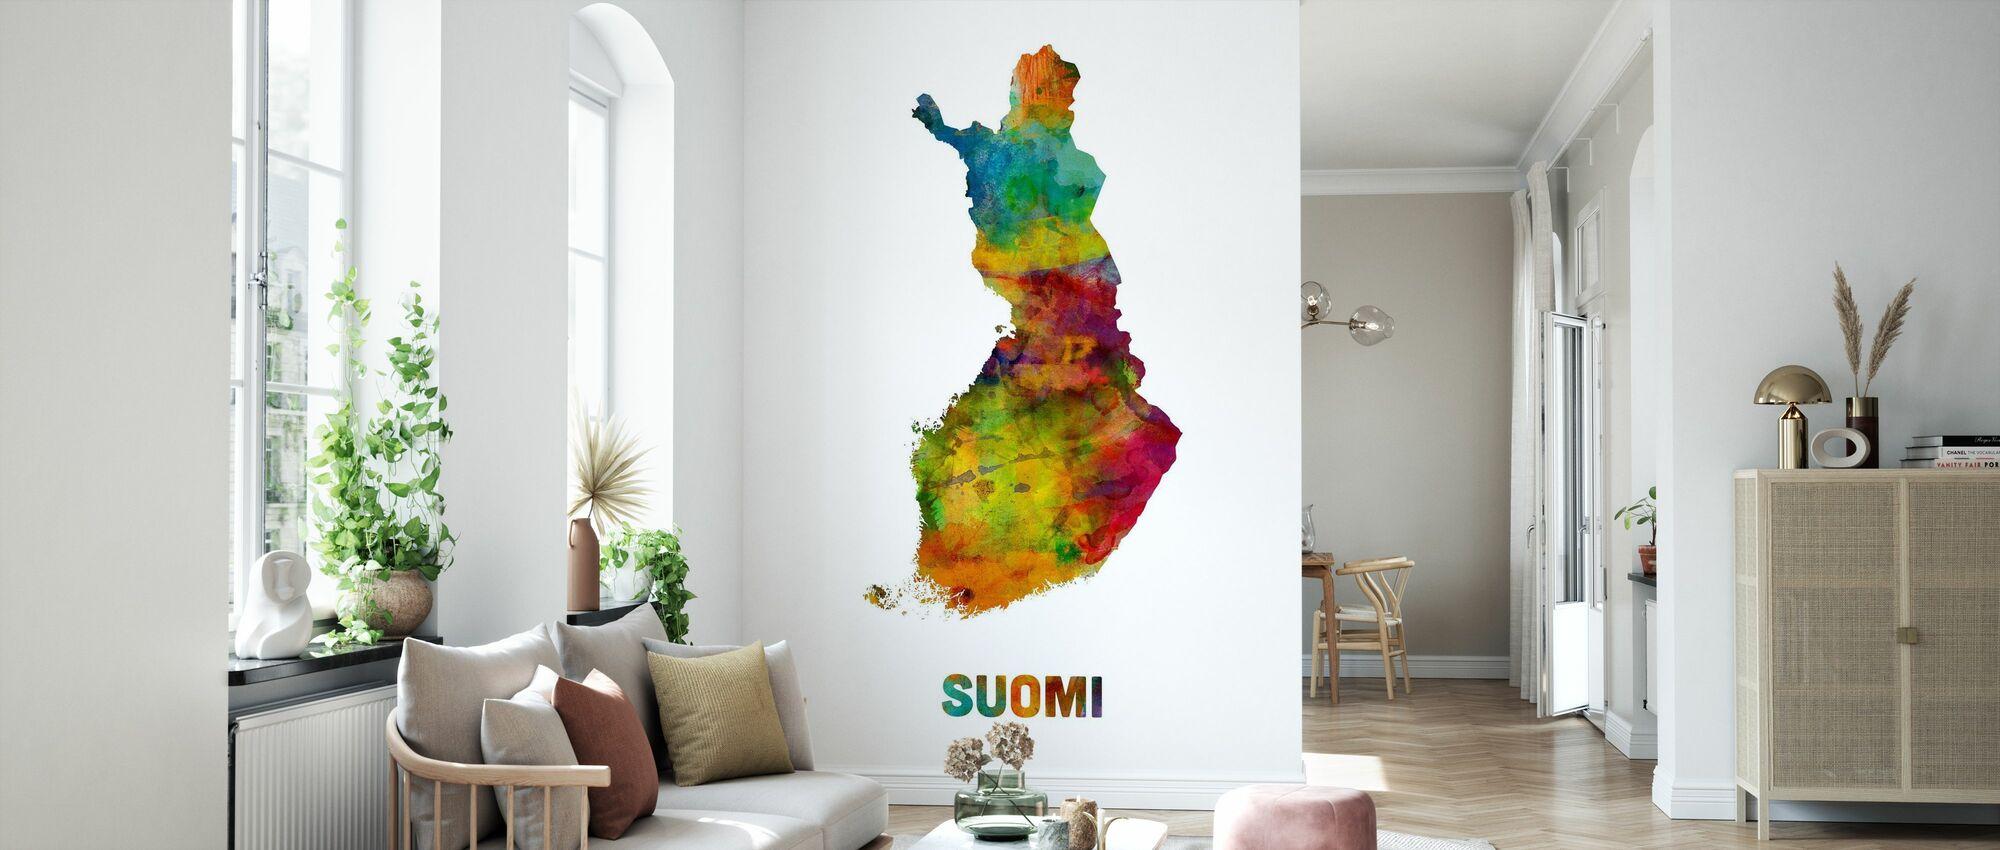 Finland Watercolor Map - Wallpaper - Living Room